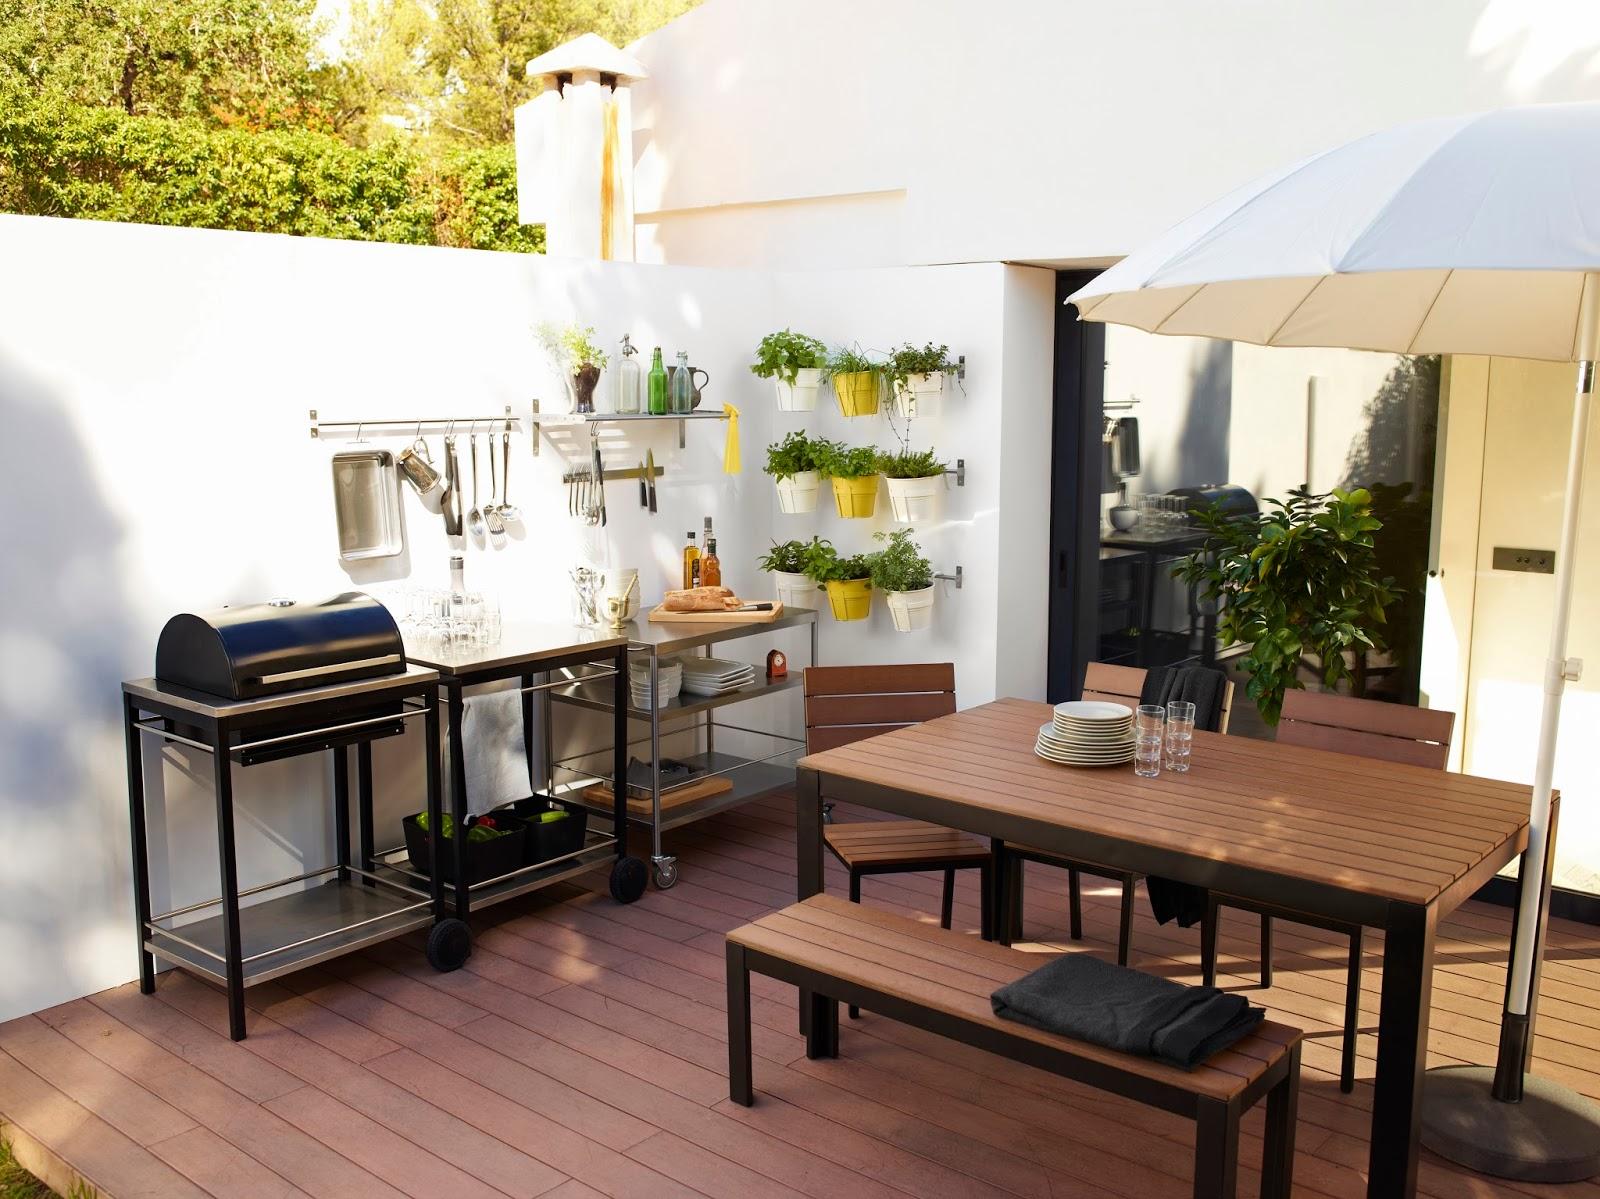 Colecci n primavera 2014 de ikea el bungalow - Ikea mesas jardin ...